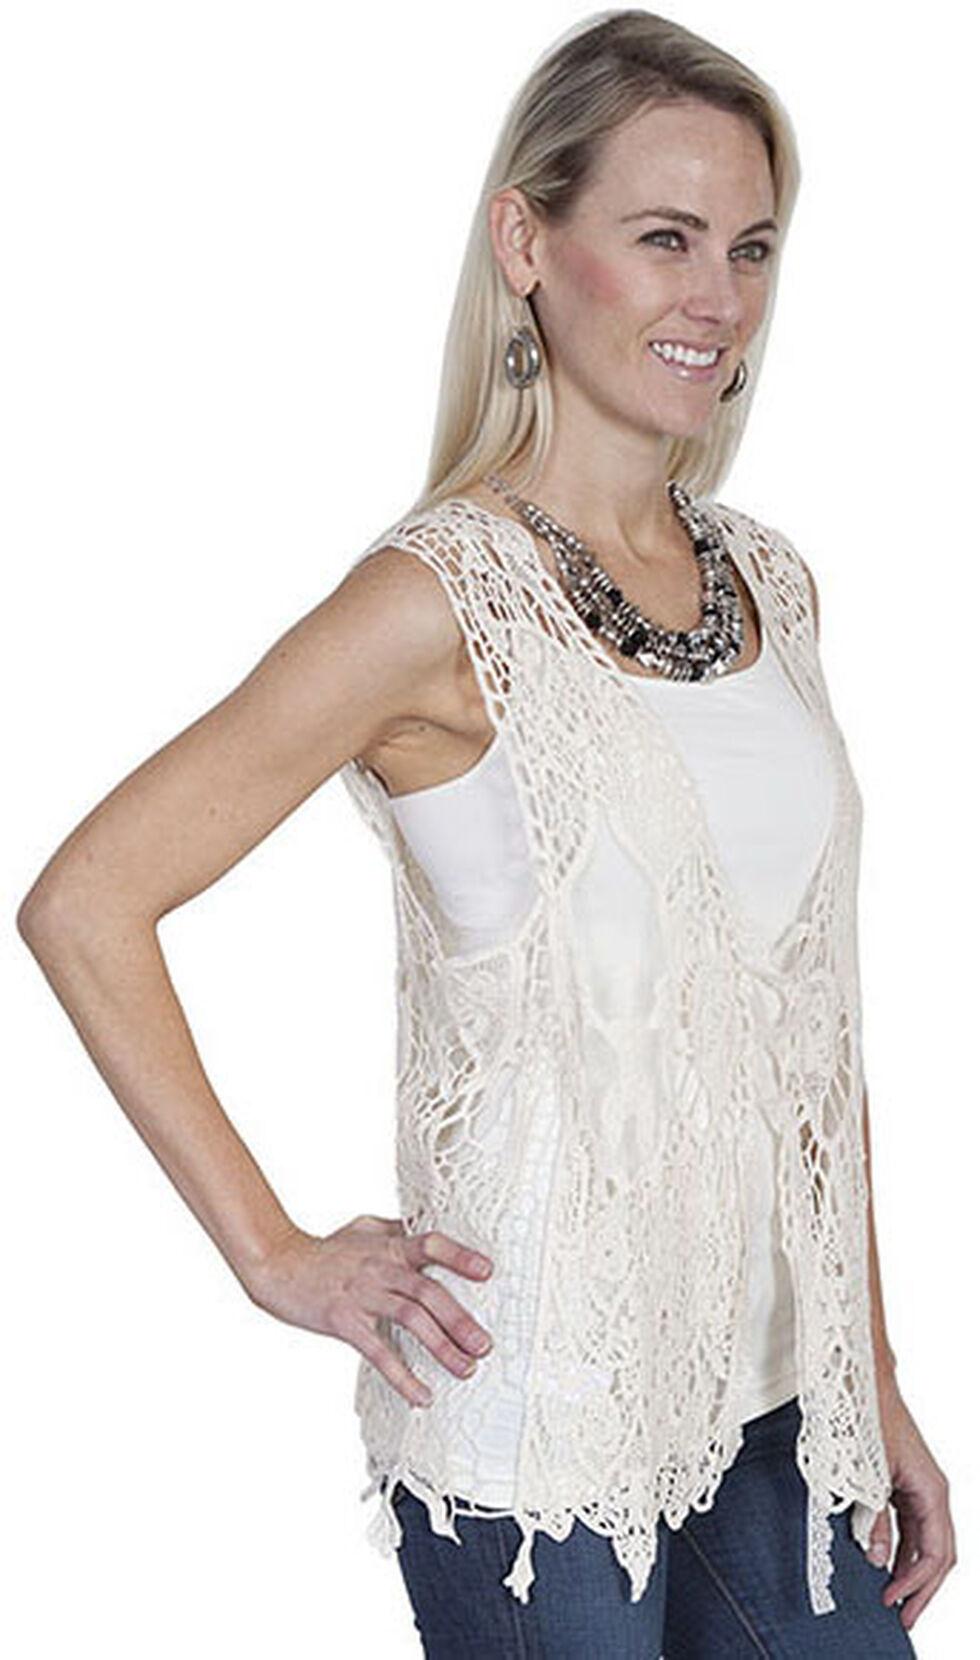 Scully Honey Creek Lace-Up Front Crochet Vest, Ivory, hi-res